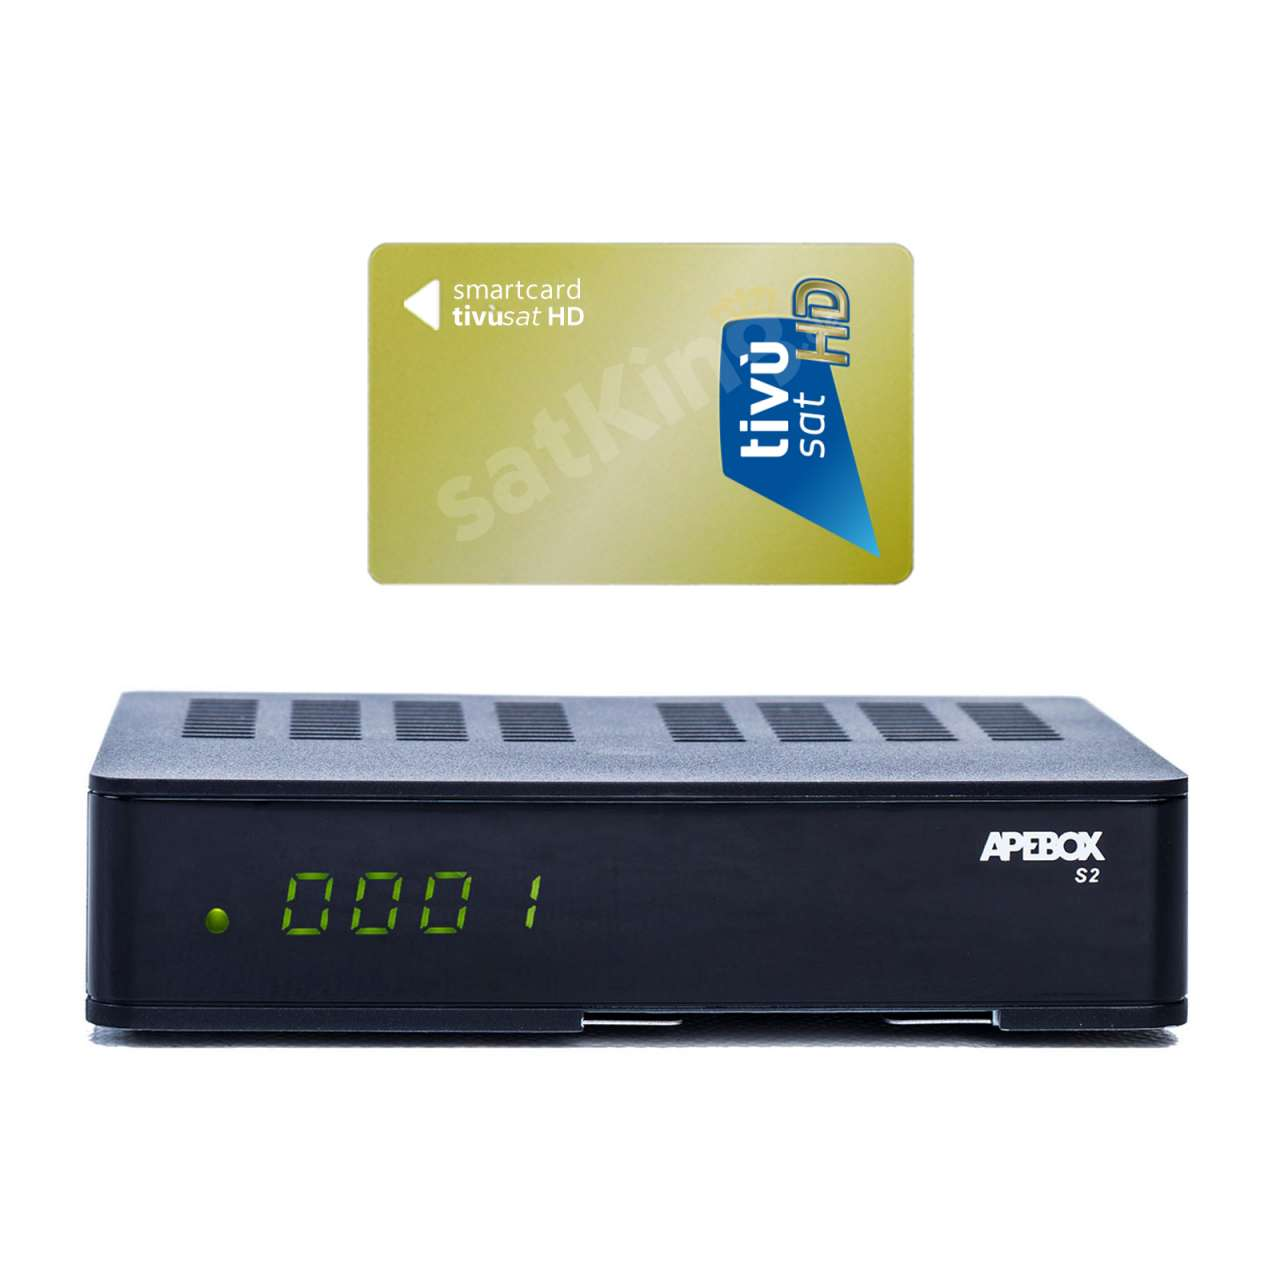 Apebox S2 Full HD H.265 LAN DVB-S2 Sat Receiver mit HD TIVUSAT Karte Aktiv RECAPE01T